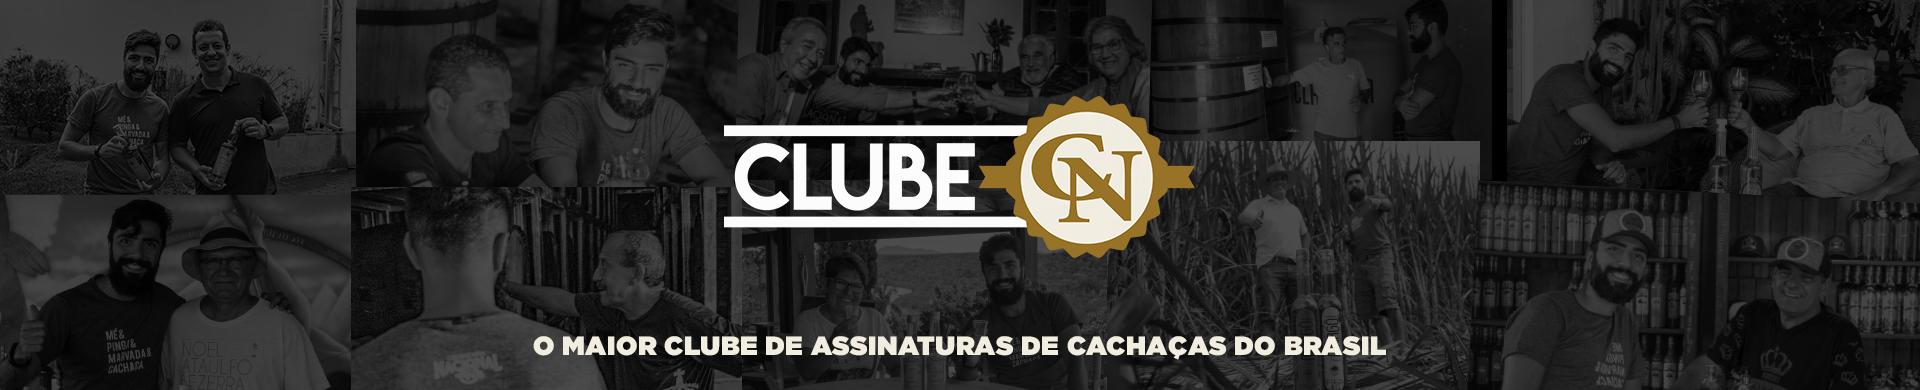 Banner Cabeçalho Pagina ClubeCN